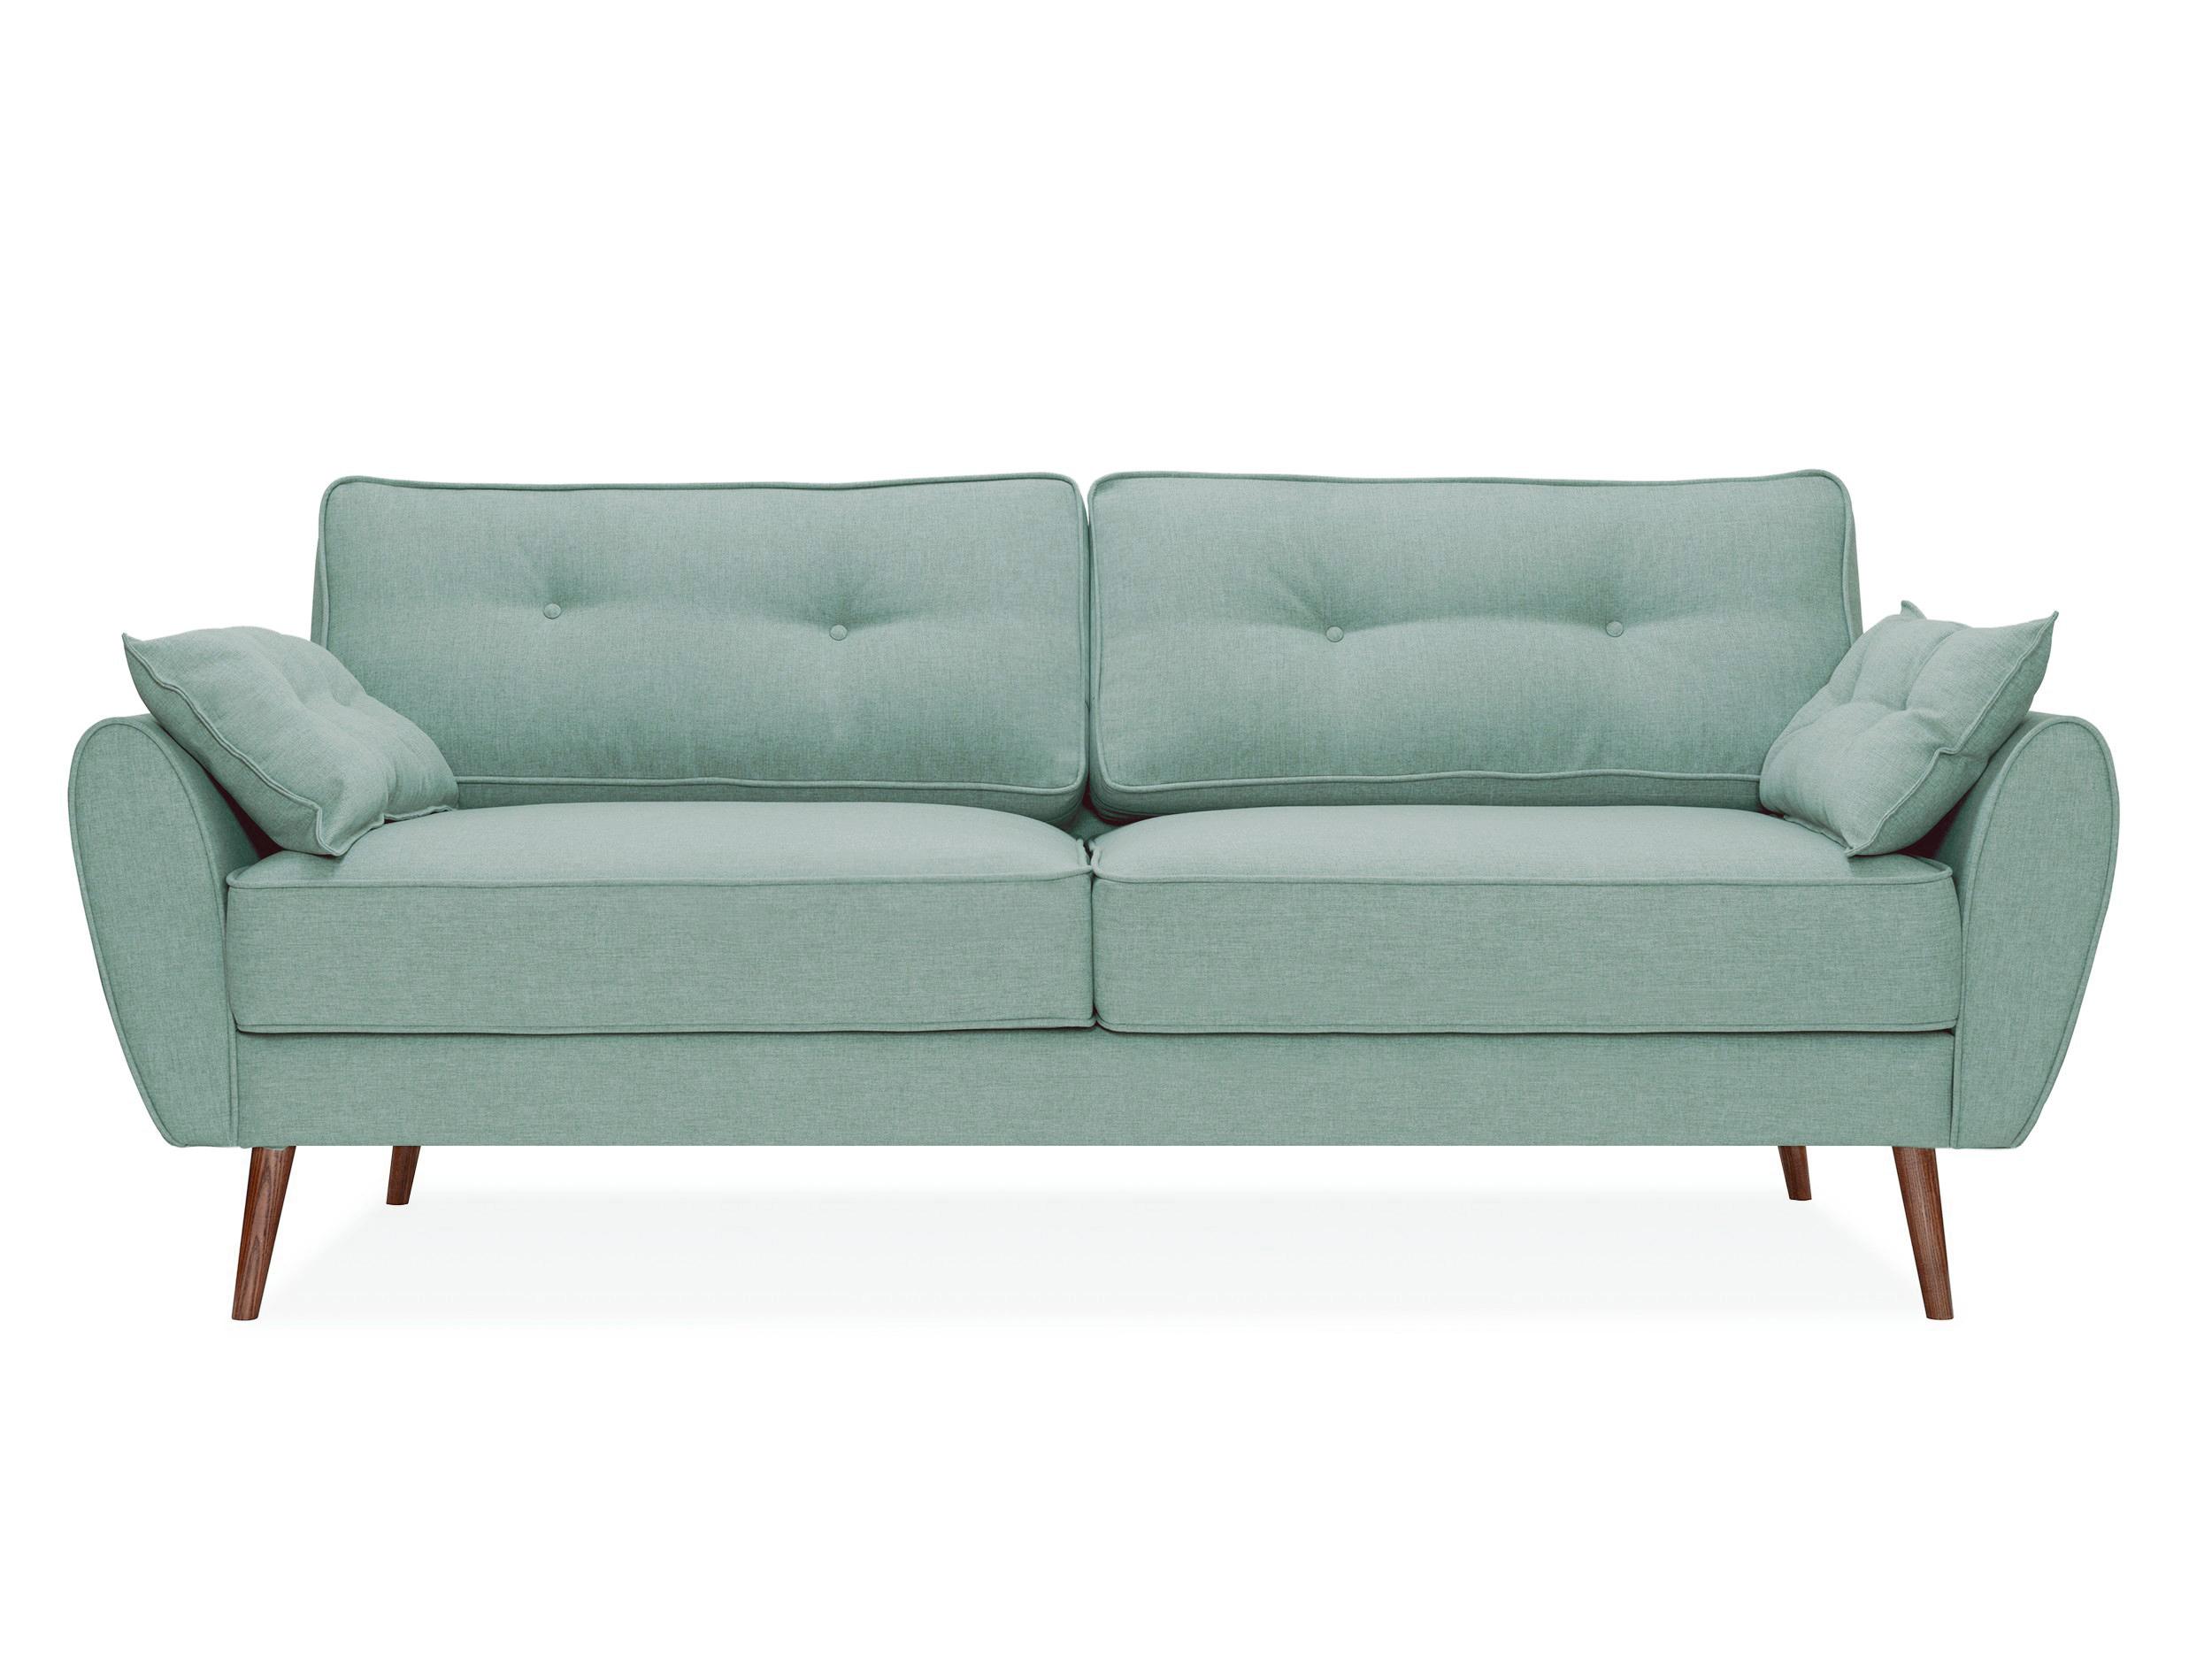 Myfurnish диван vogue зеленый  66697/14